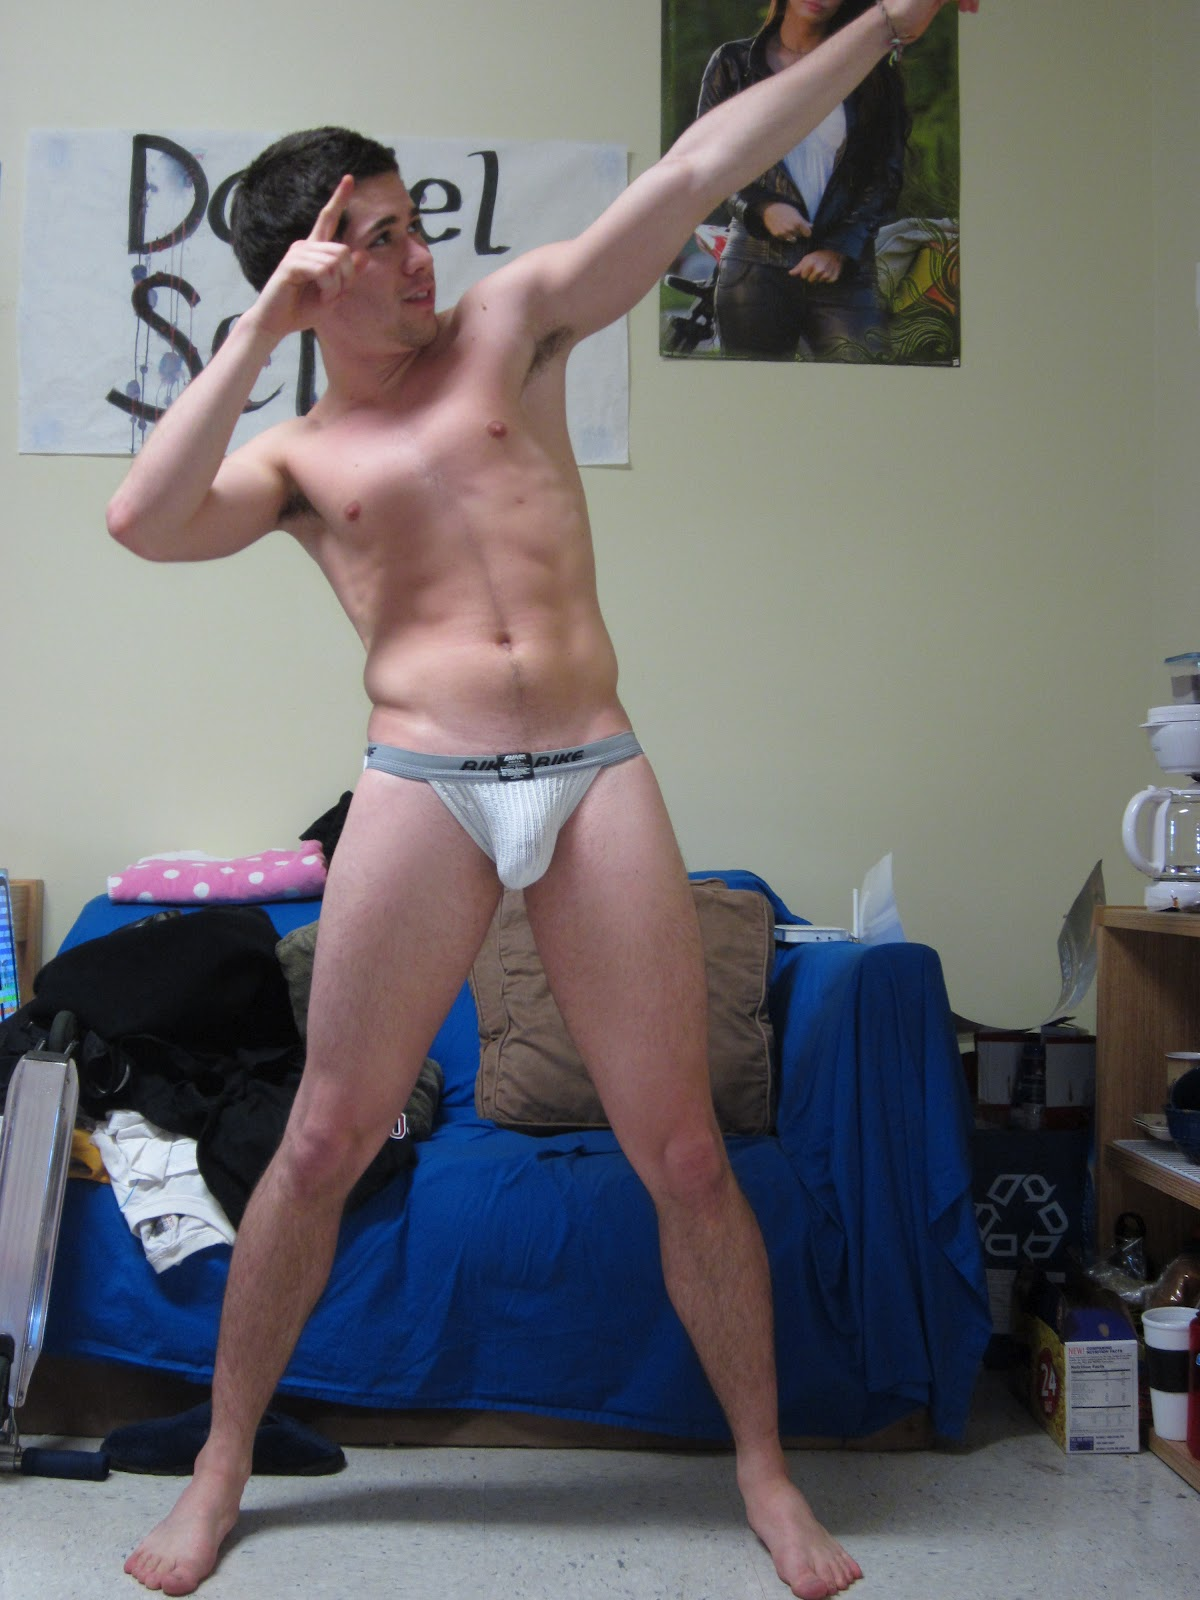 image Straight nude buff guys gay preston broke